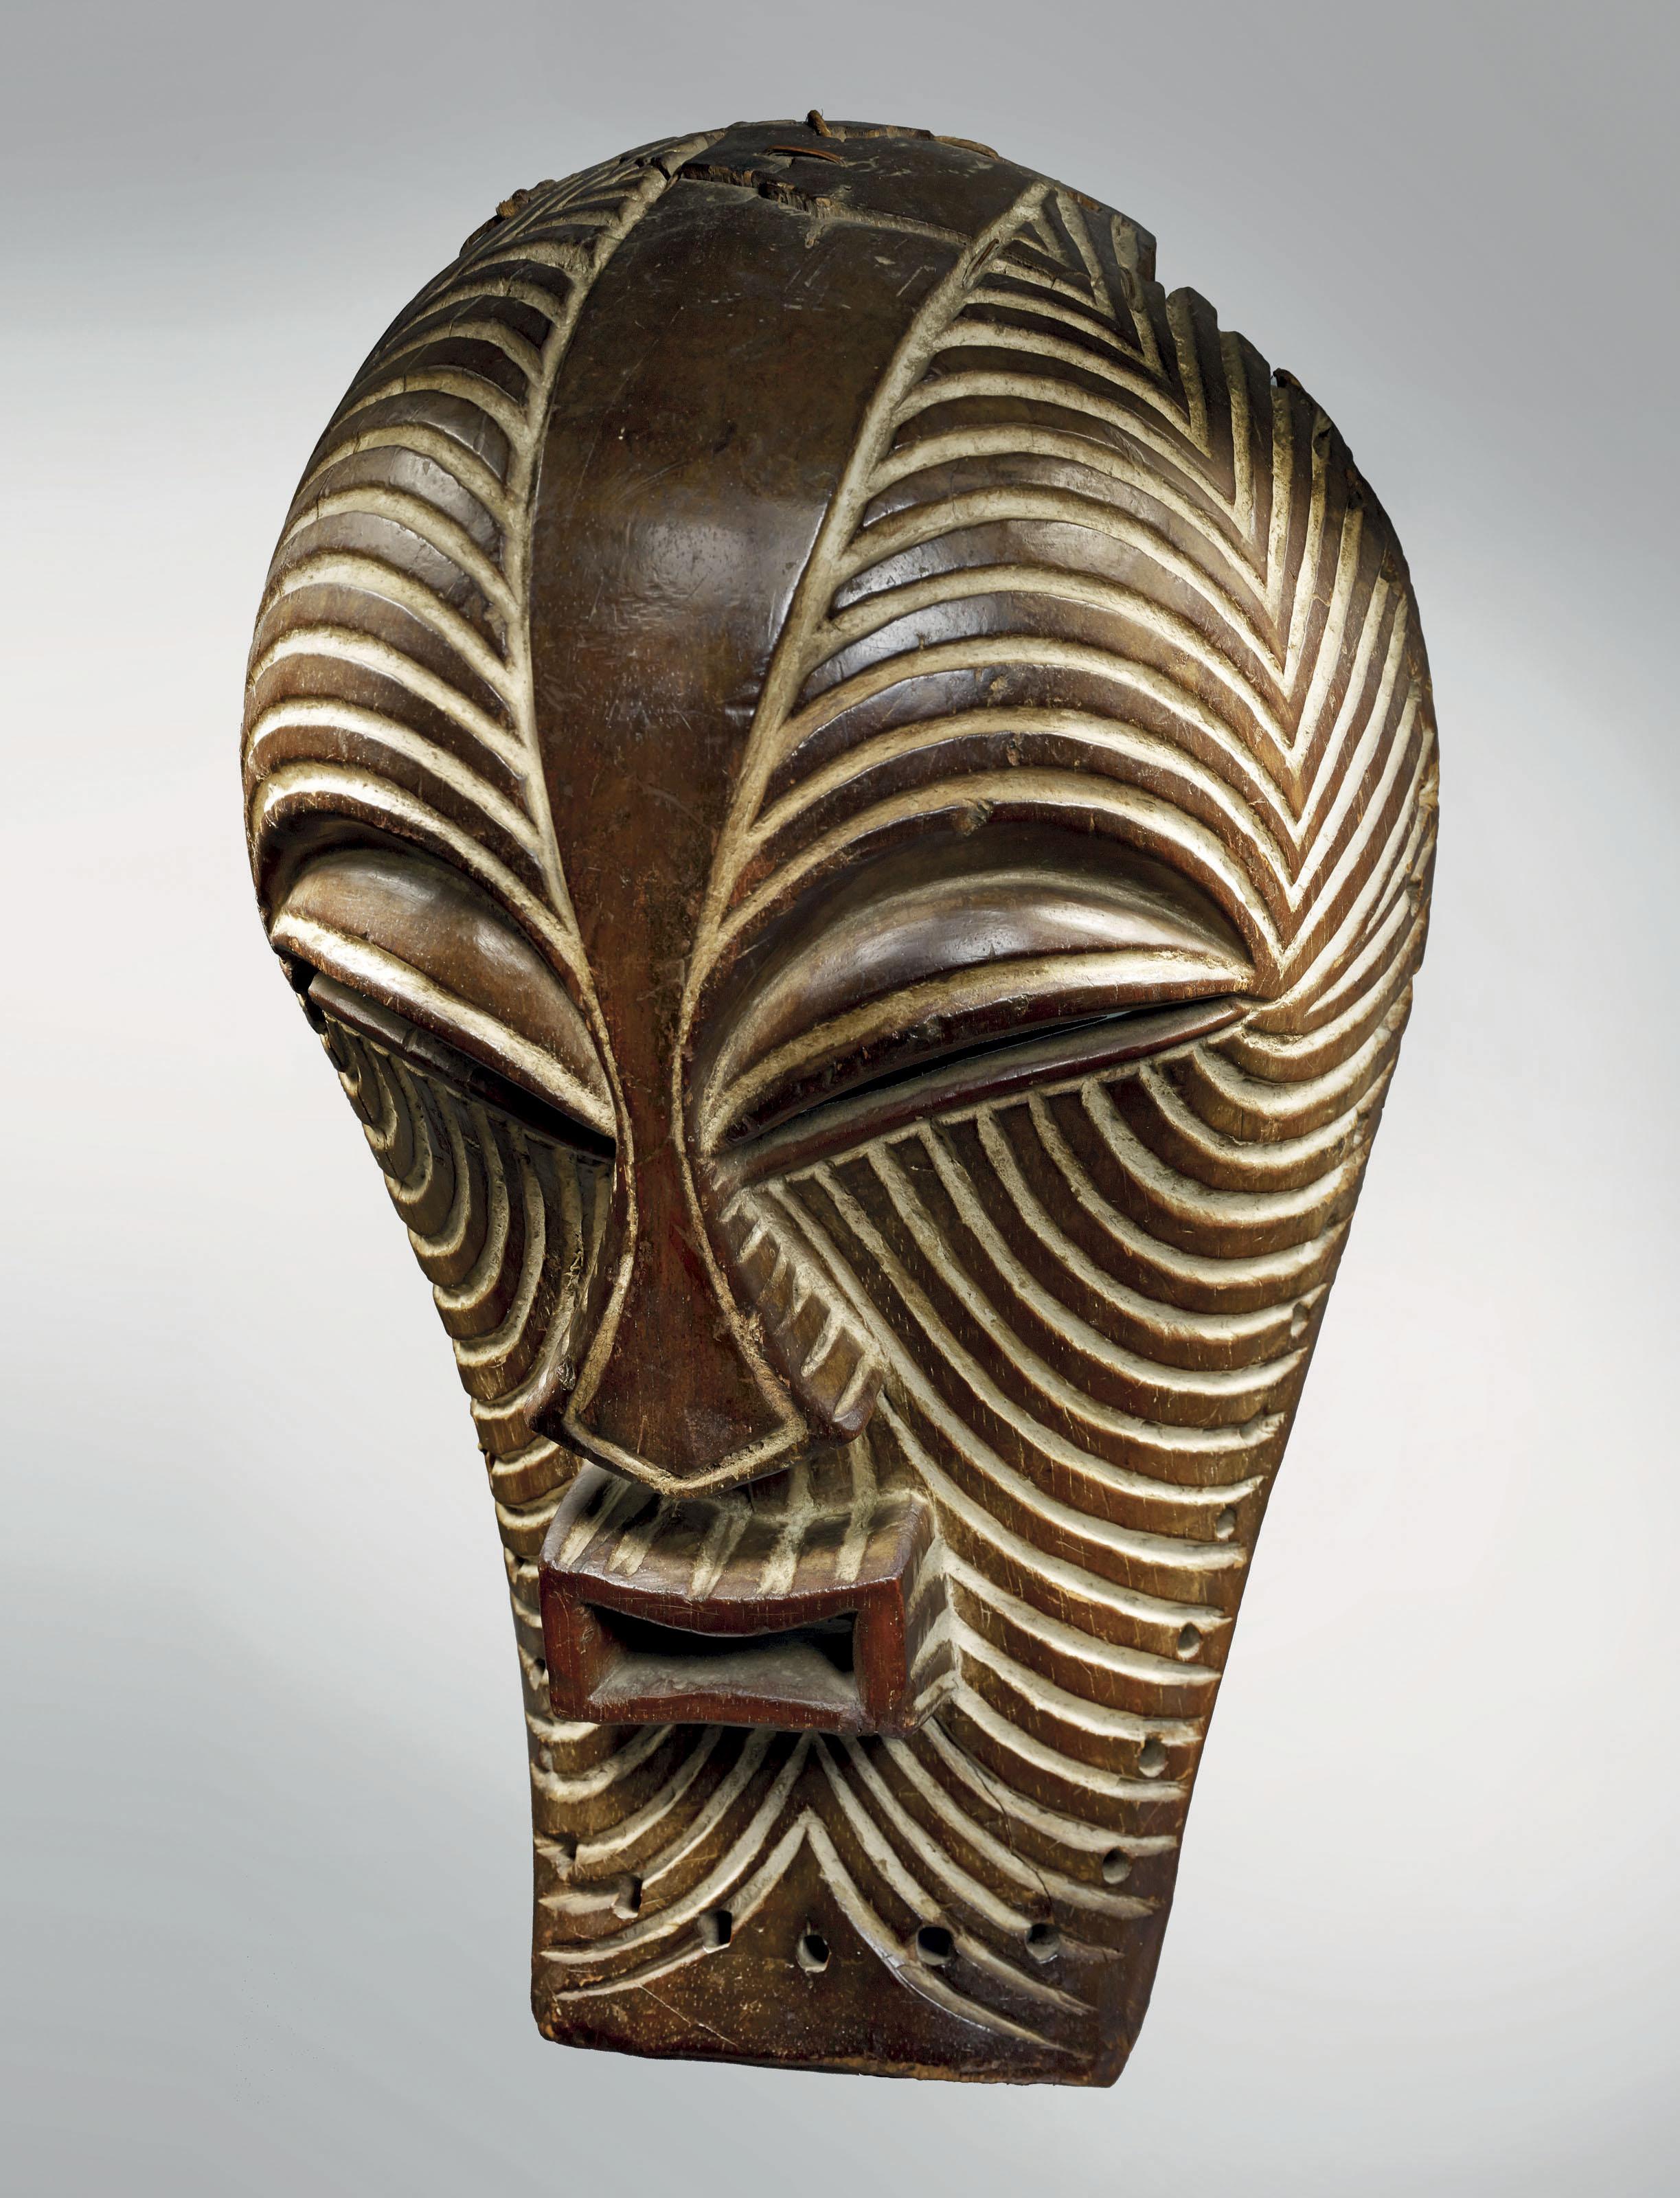 The Walschot-Schoffel Kifwebe Mask